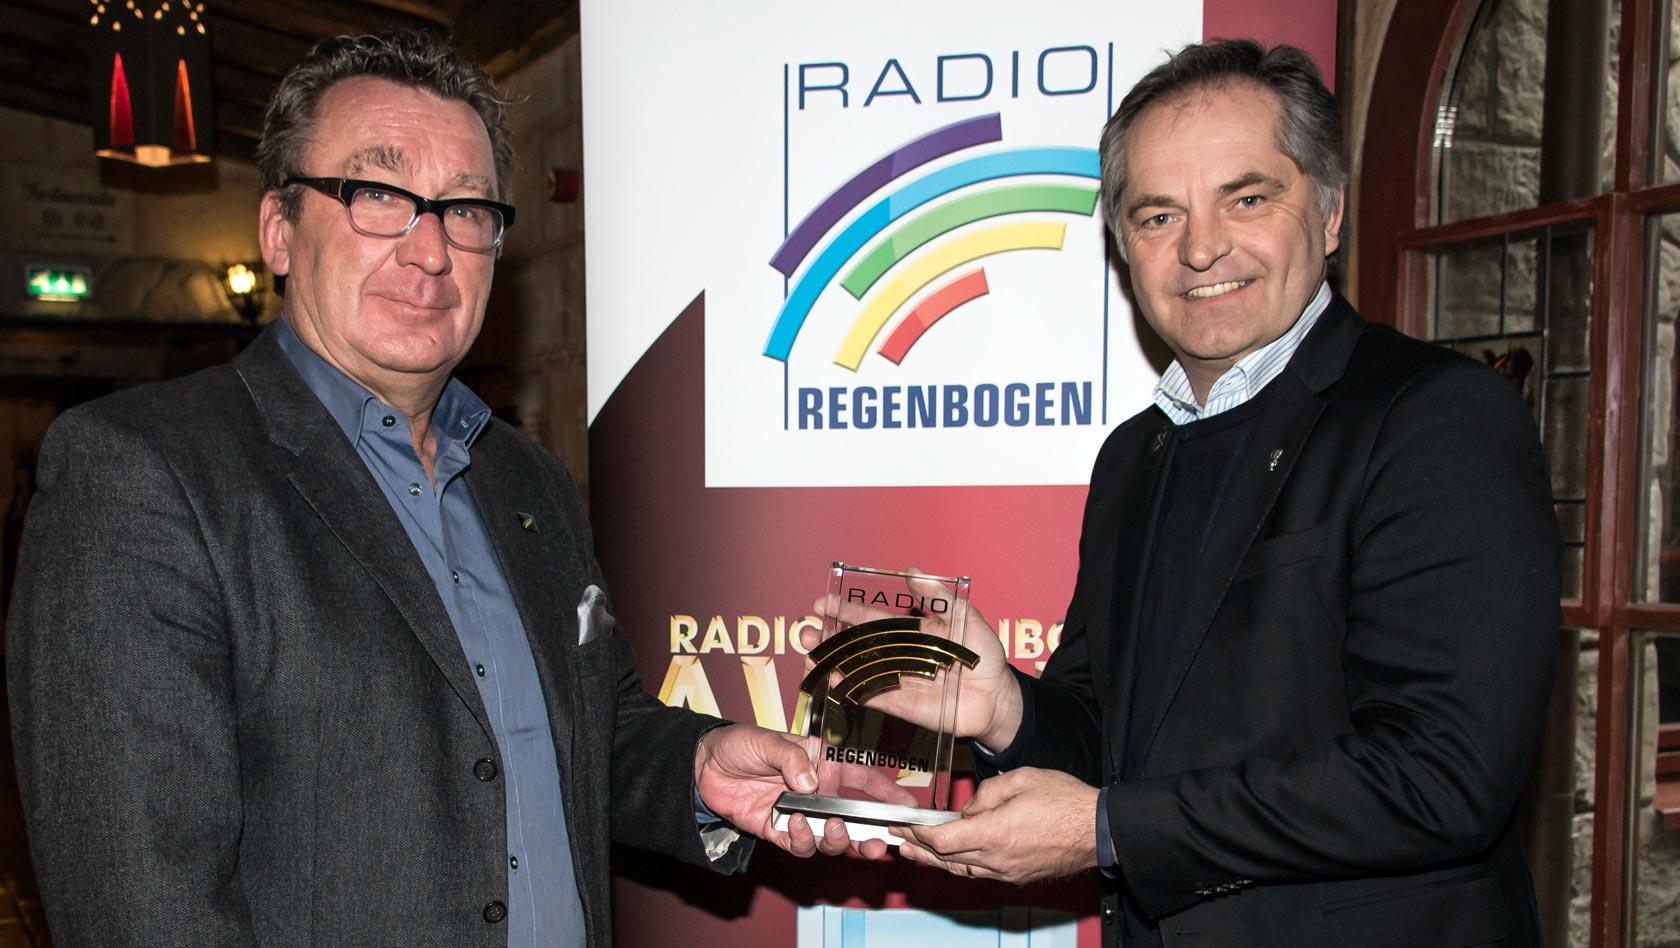 radio regenbogen award 2016 ausverkauft mediengala im. Black Bedroom Furniture Sets. Home Design Ideas